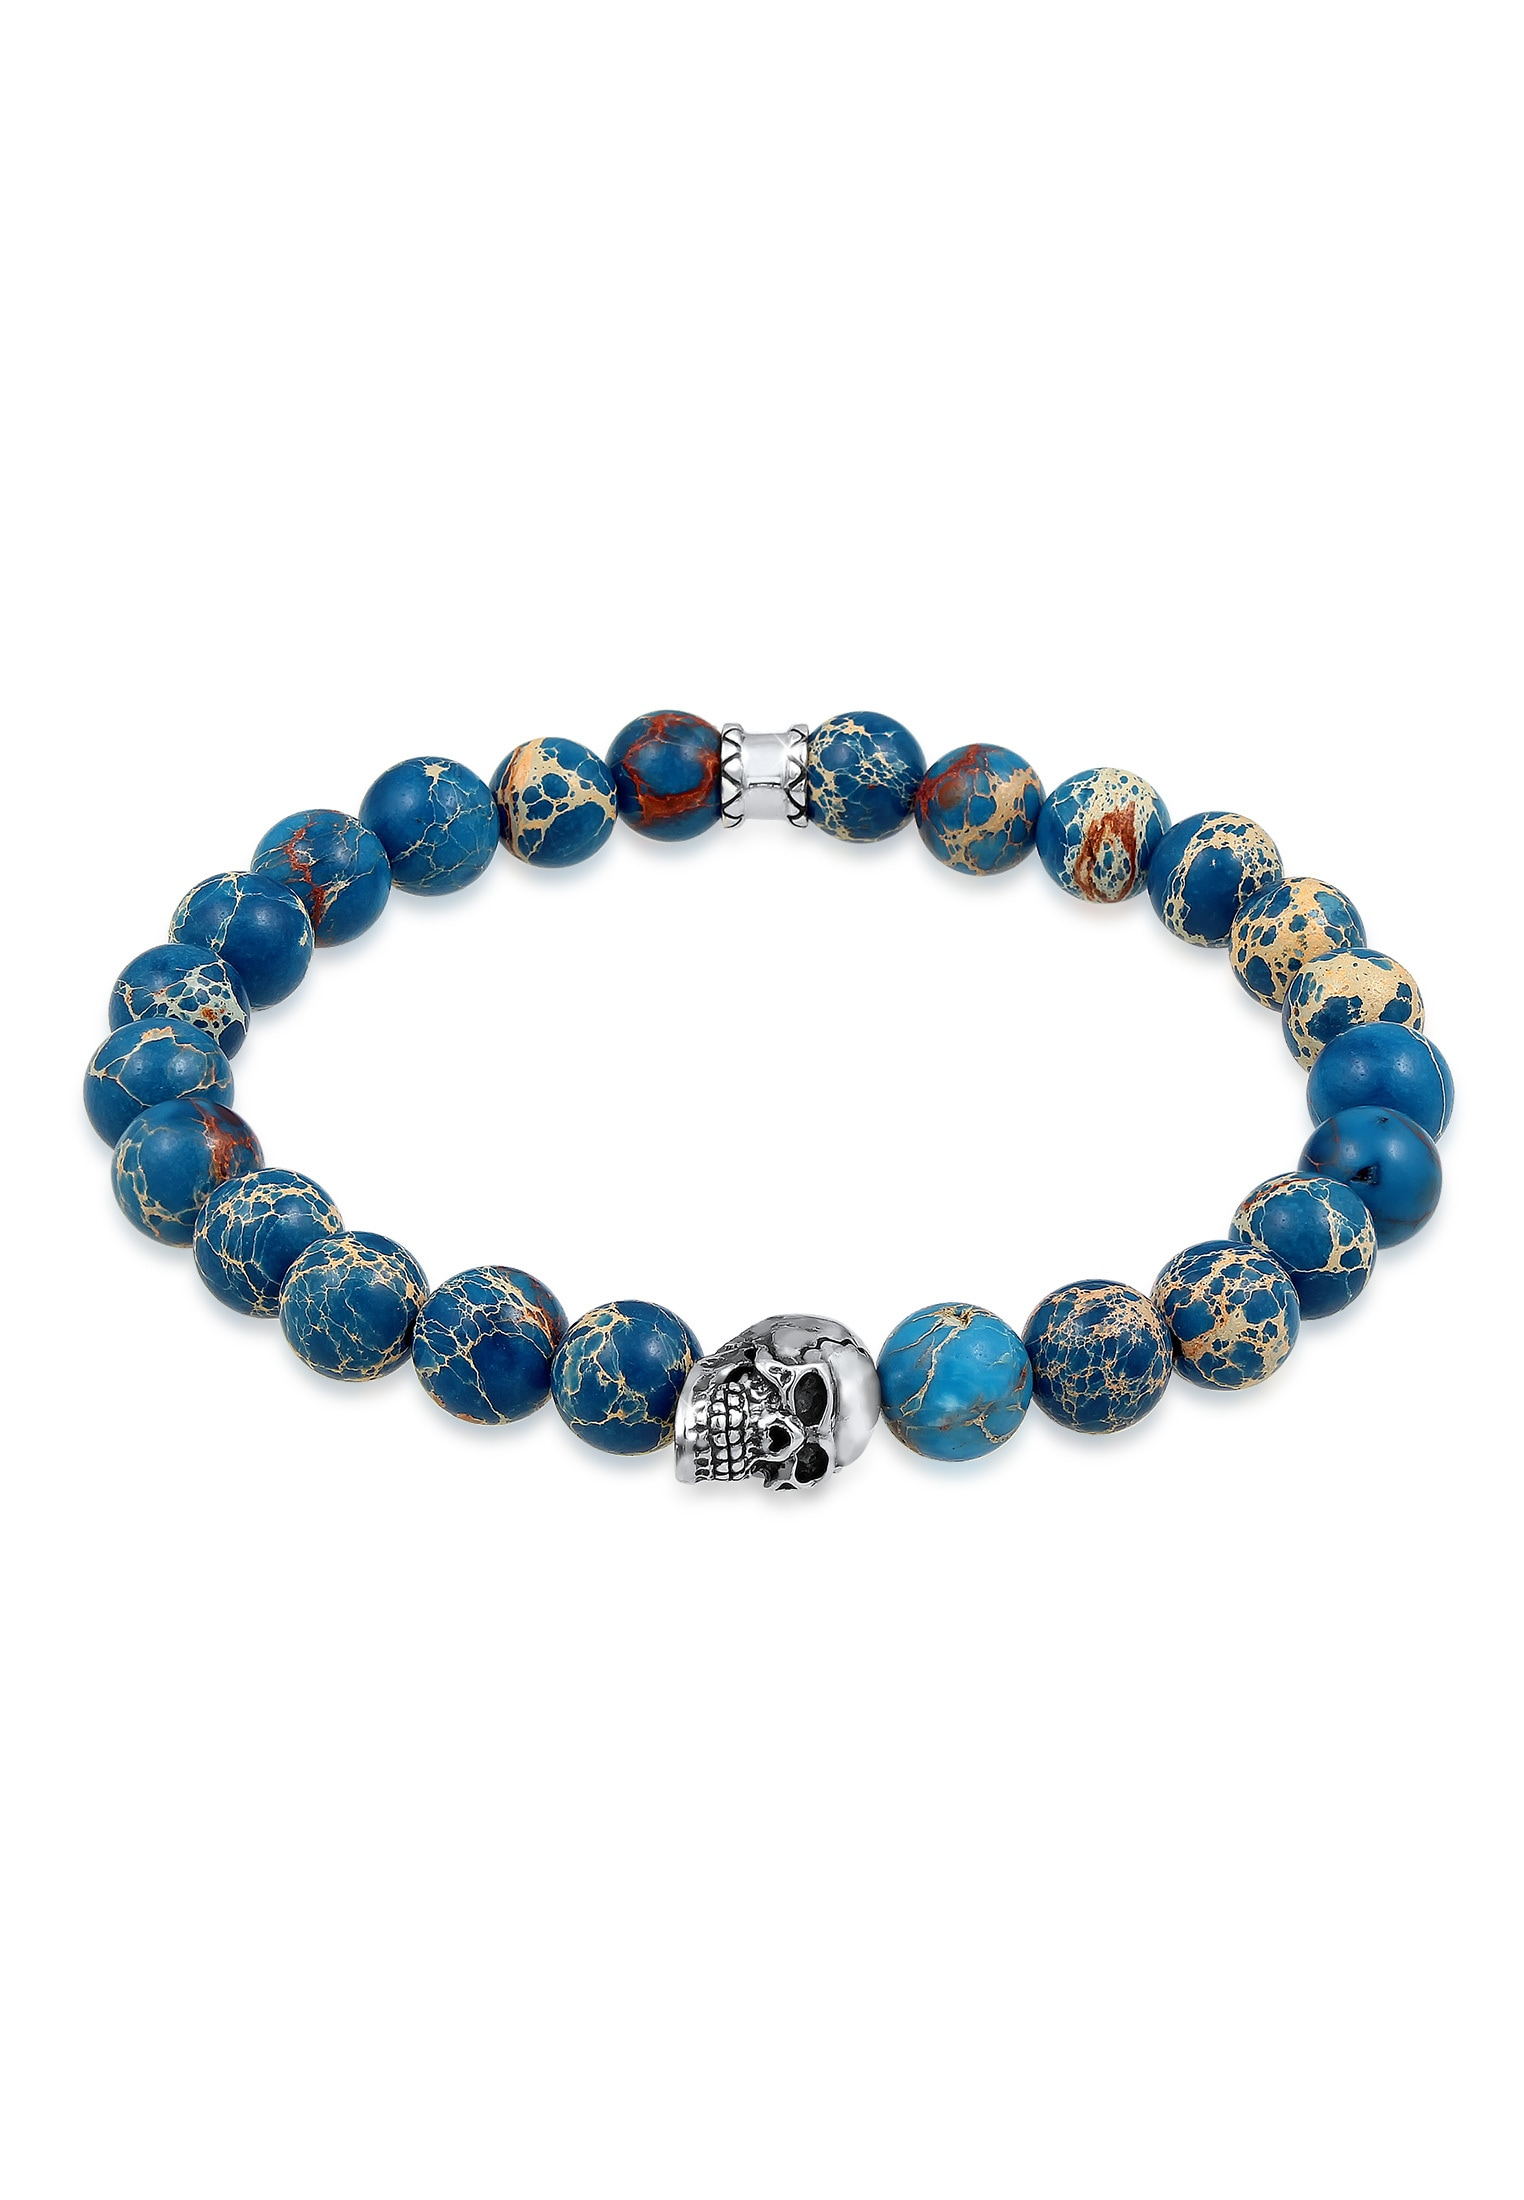 Kuzzoi Armband Herren Blauer Achat Stein mit Totenkopf Silber | Schmuck > Armbänder > Silberarmbänder | Blau | Kuzzoi